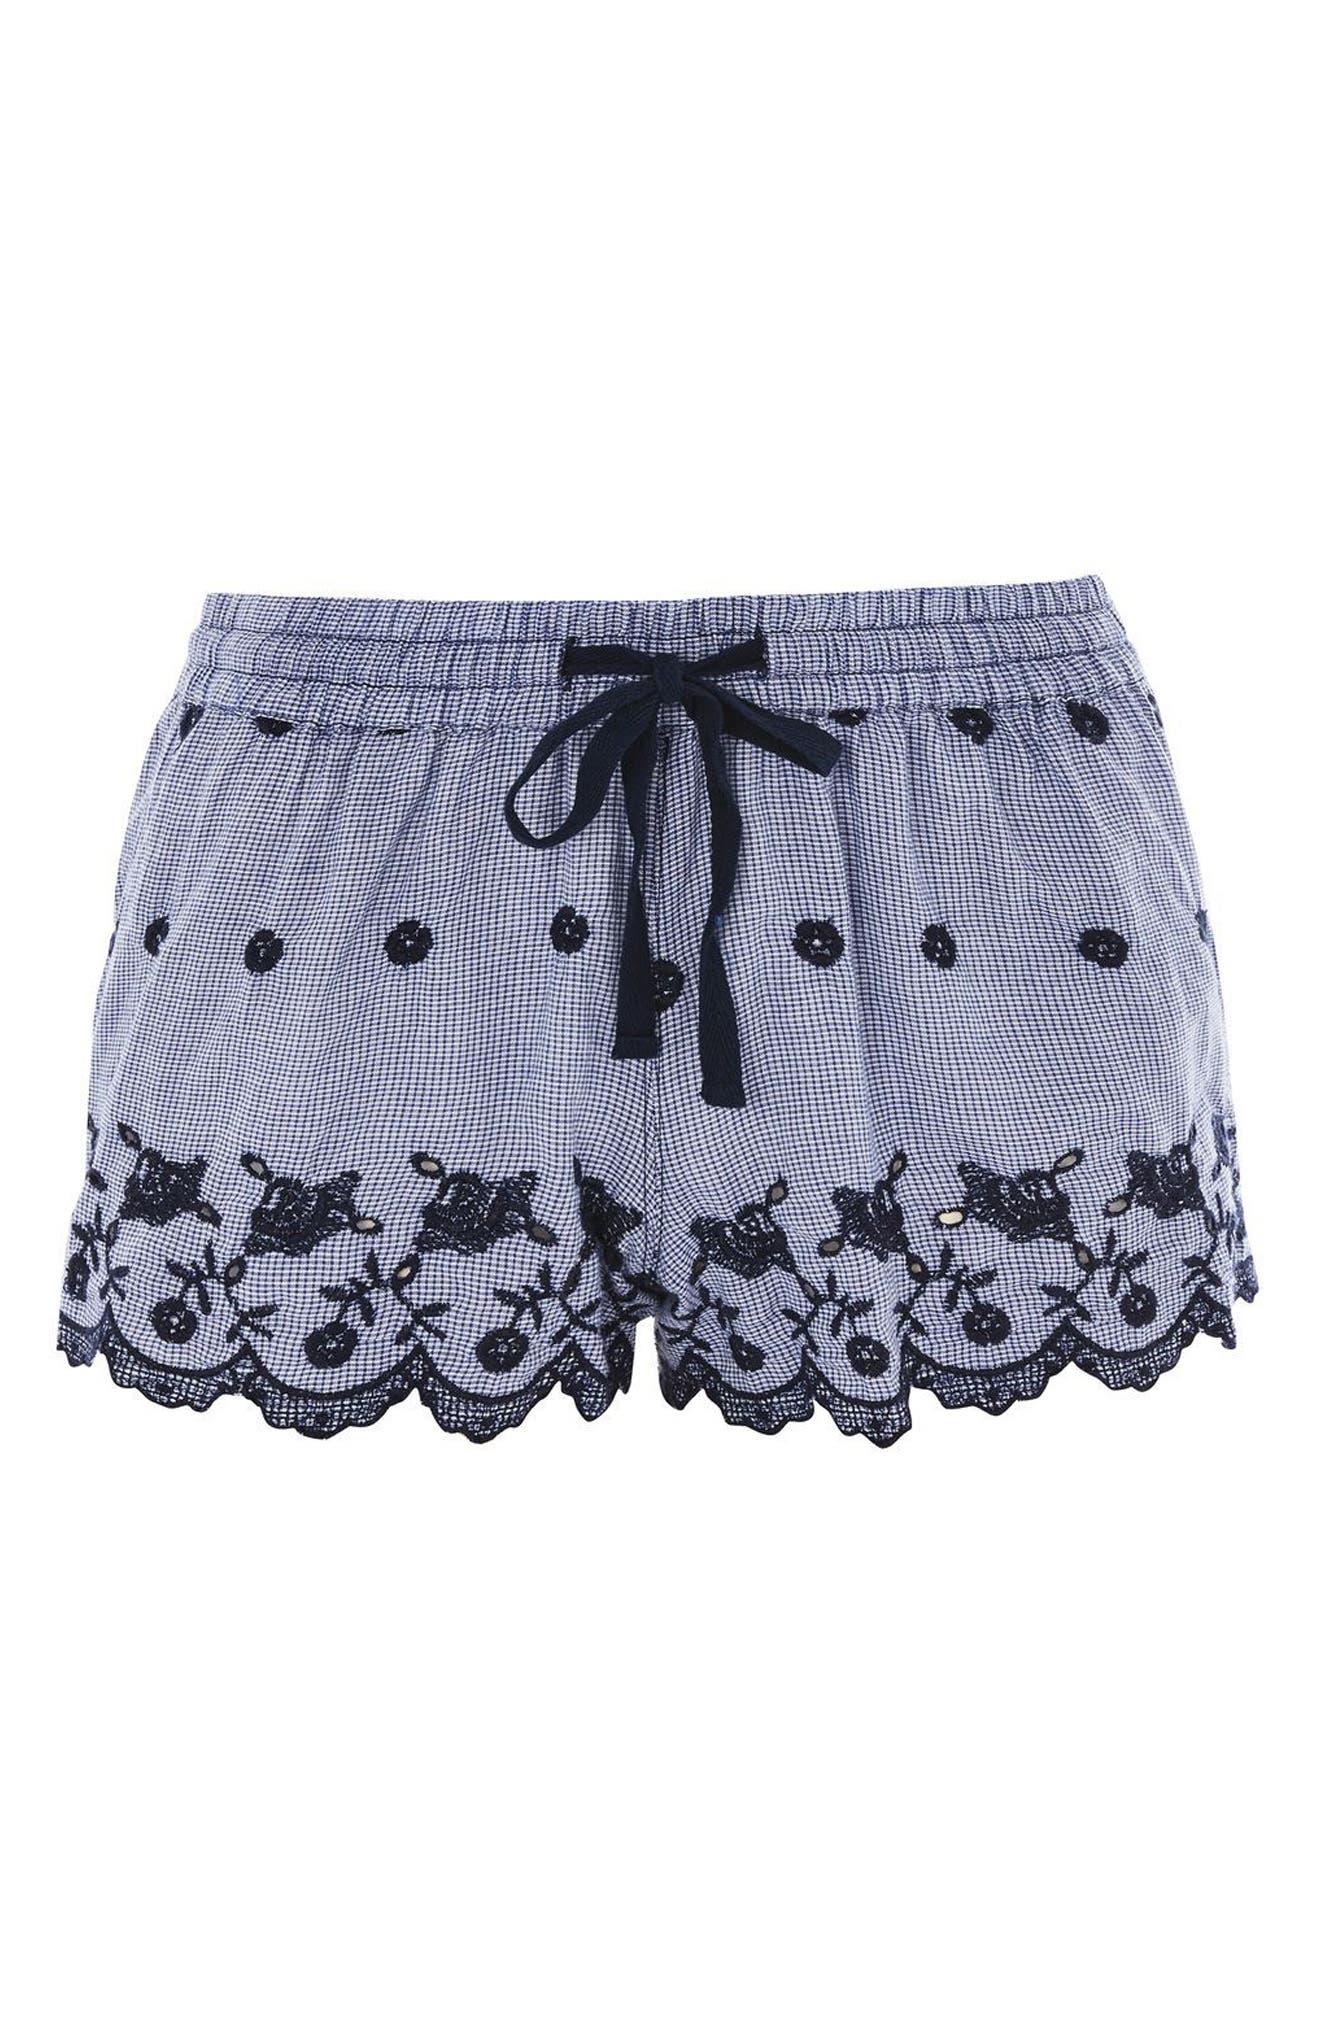 Alternate Image 1 Selected - Topshop Cotton Gingham Pajama Shorts